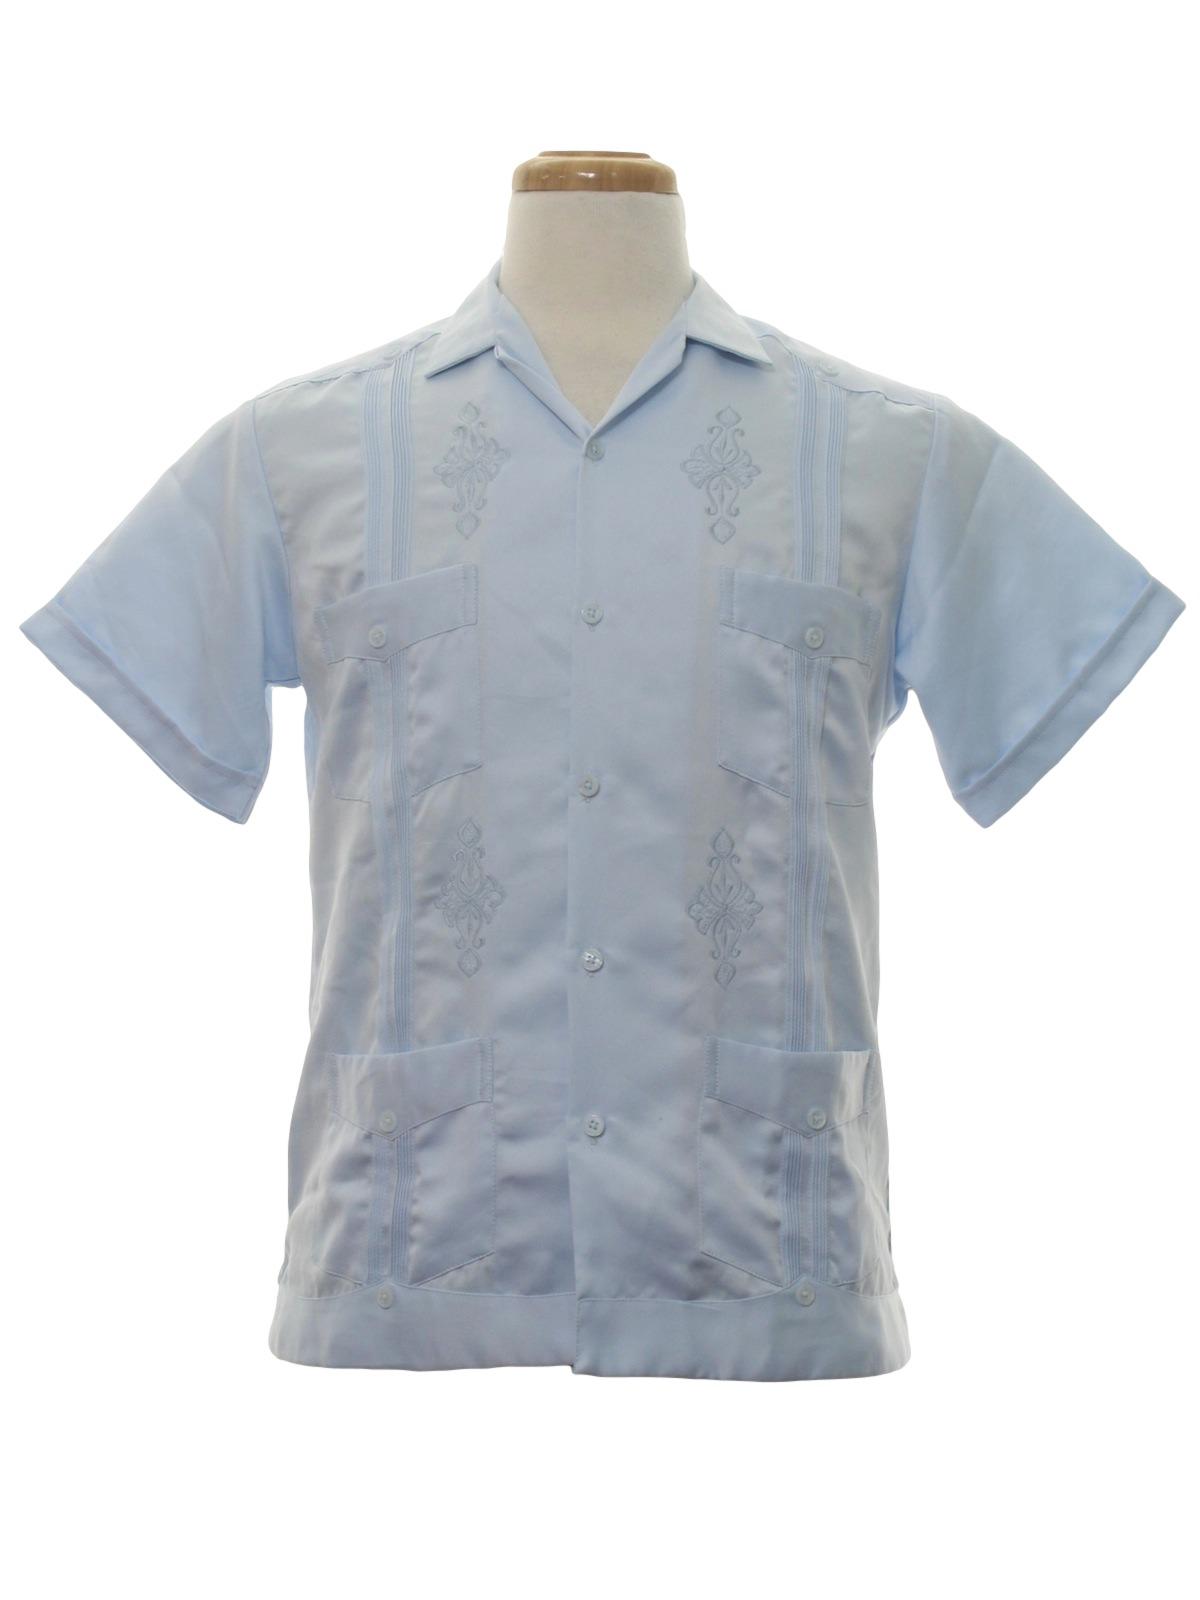 66db4c09be 80s vintage yucamex guayabera shirt 80s yucamex mens powder blue background  satin polyester short sleeve guayabera